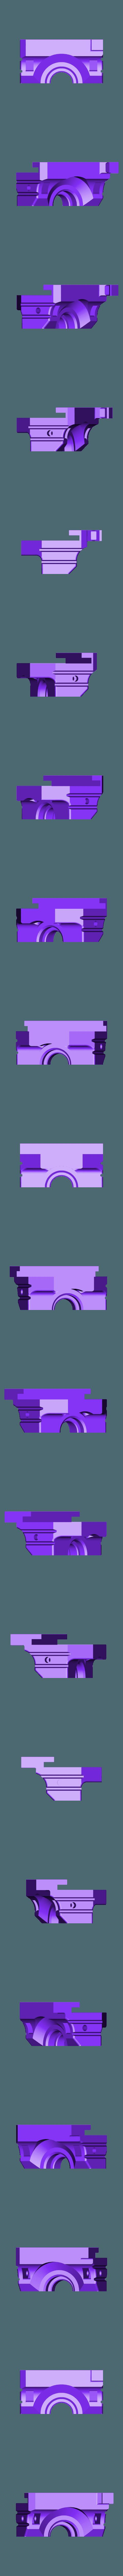 CR-10_HD-modular-mount-V6_mount-body_v1.stl Download free STL file CR-10 Heavy Duty - E3D-V6_Cover 40mm Fan - Fang-Version • Design to 3D print, CSD_Salzburg